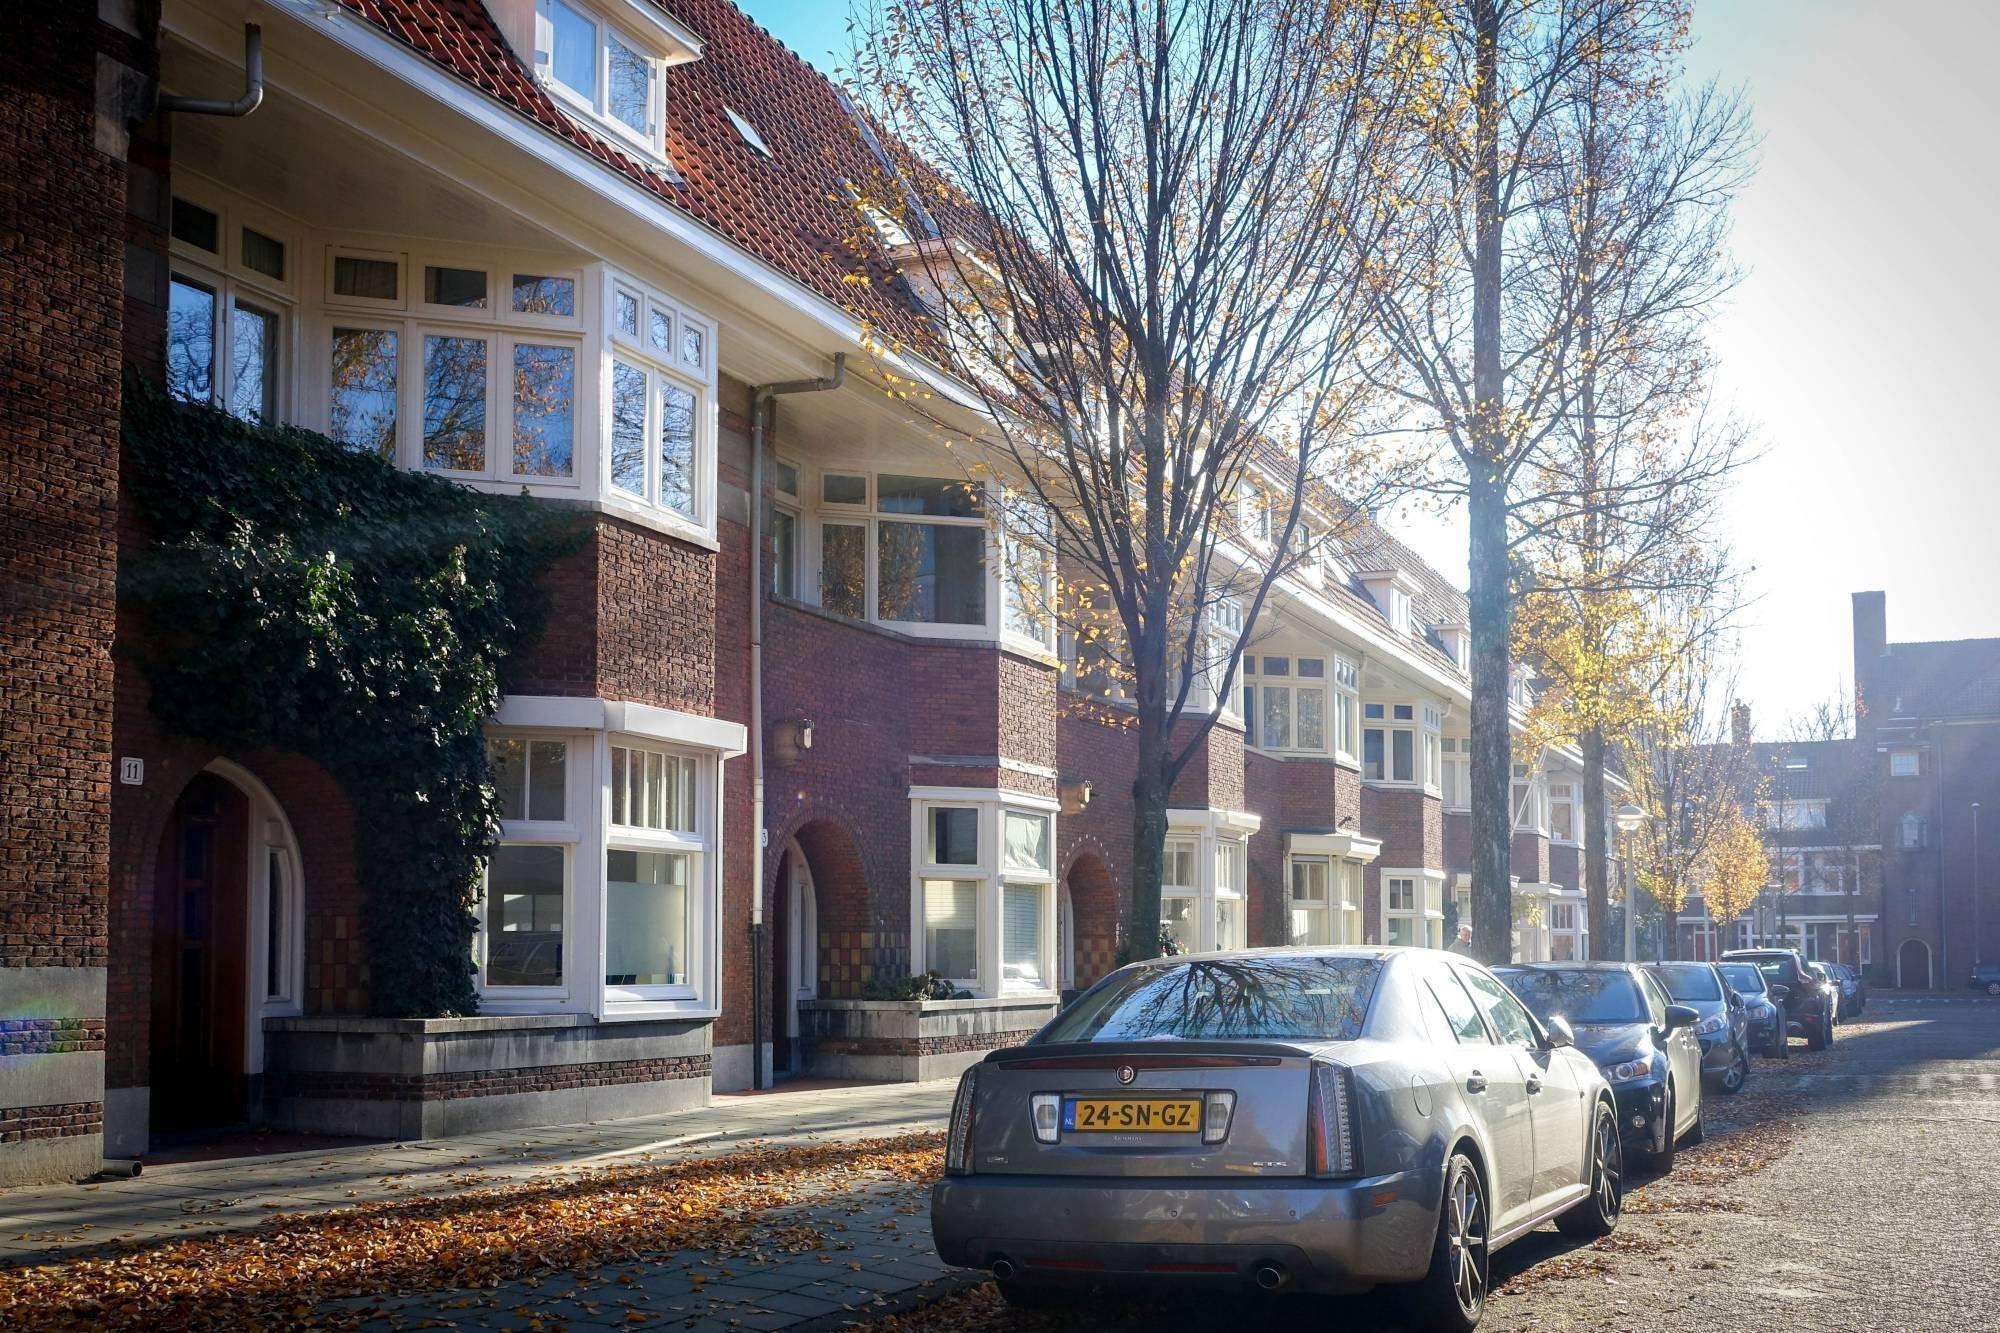 Memlingstraat, Amsterdam